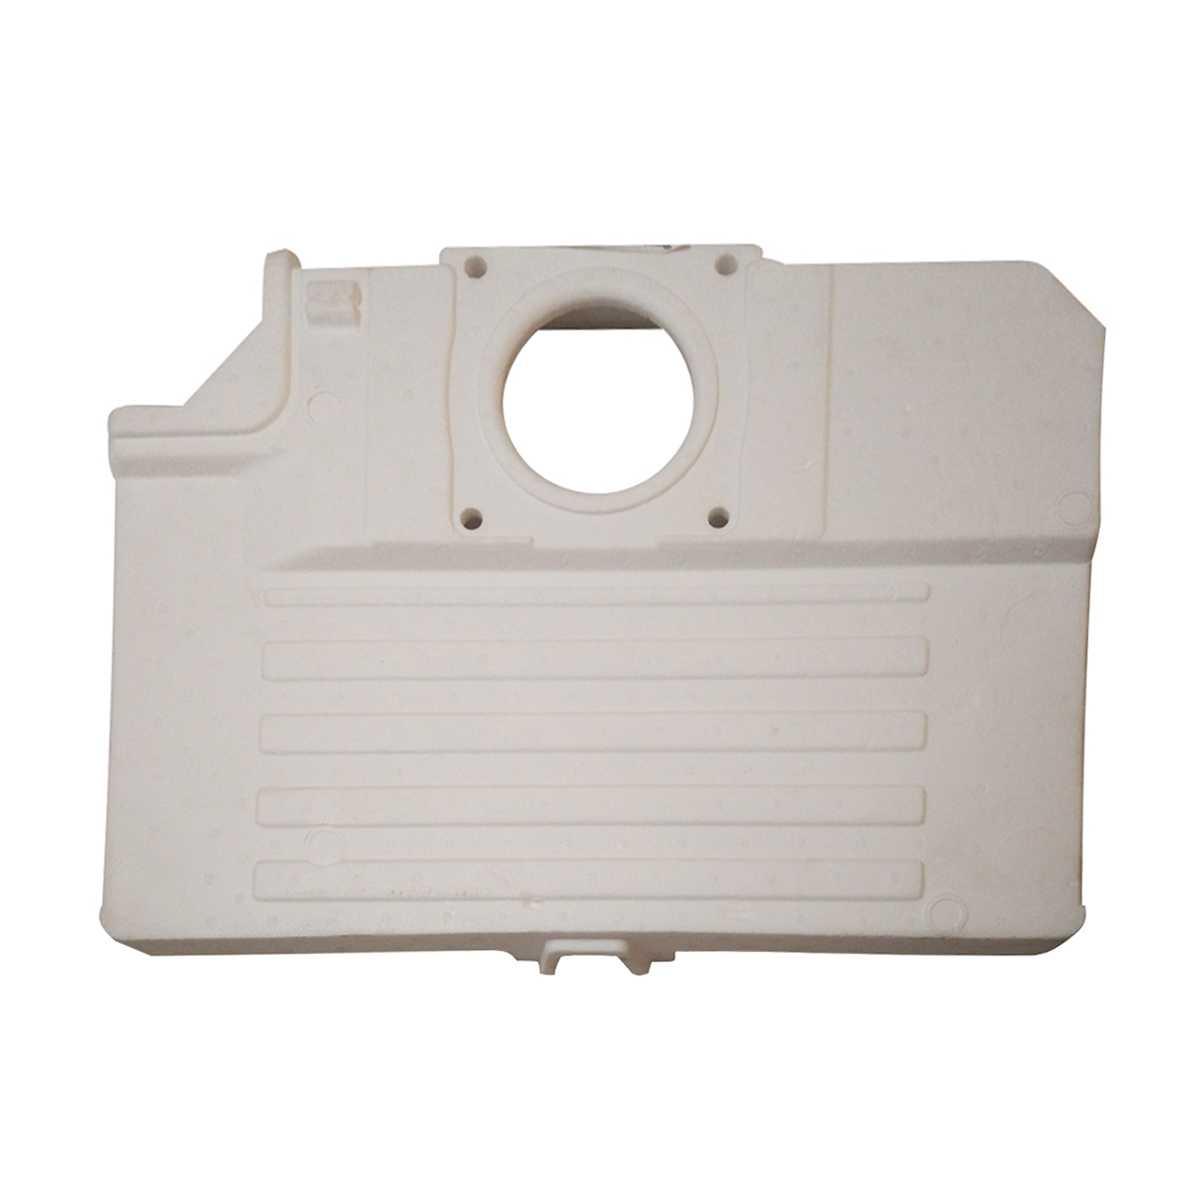 Capa traseira do evaporador geladeira Brastemp e Consul W10539793